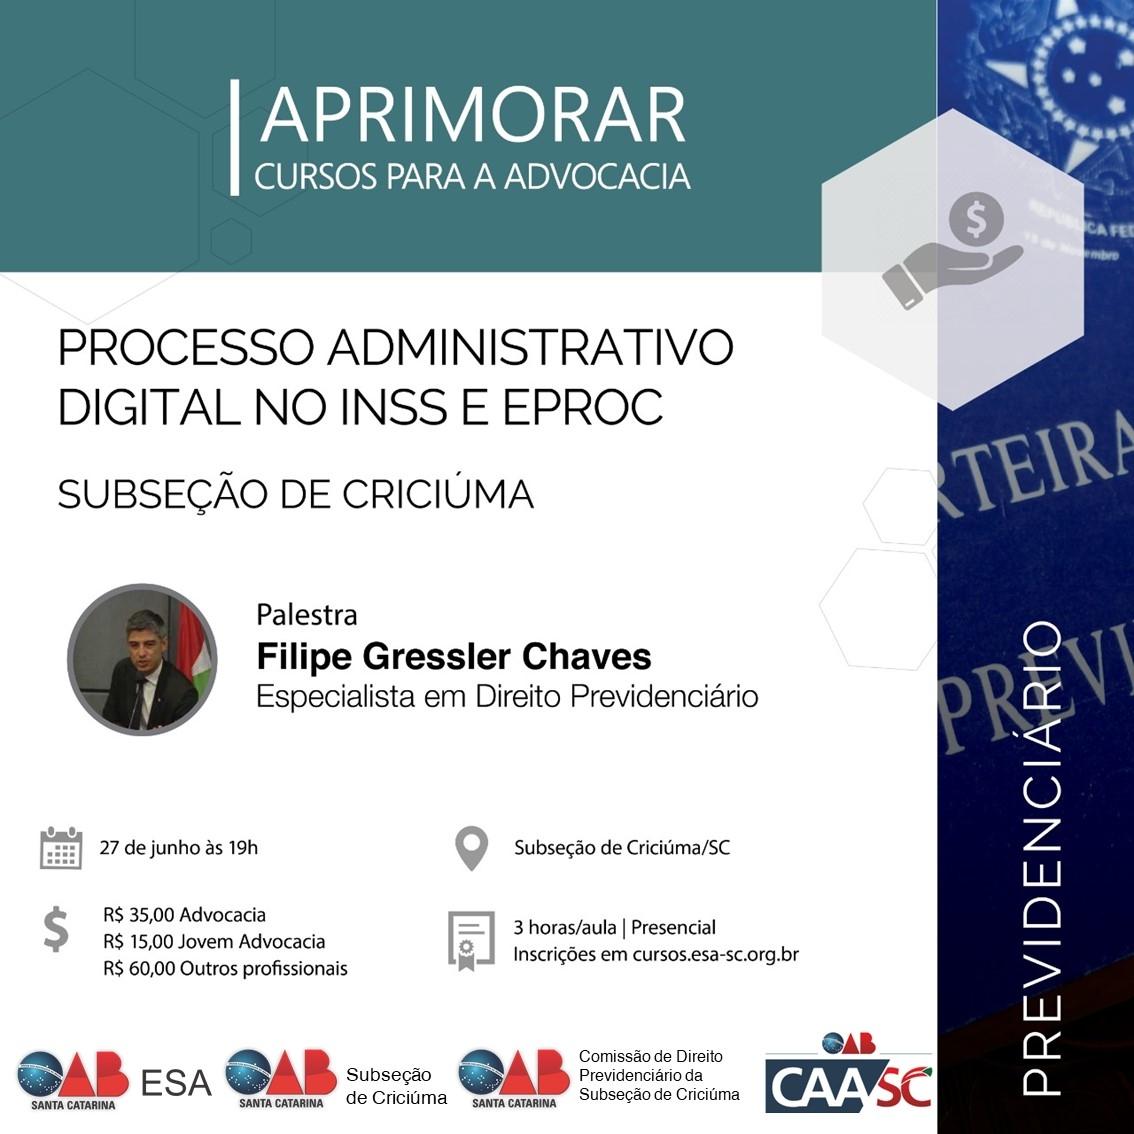 Processo Administrativo no INSS e Eproc - Criciúma.jpg